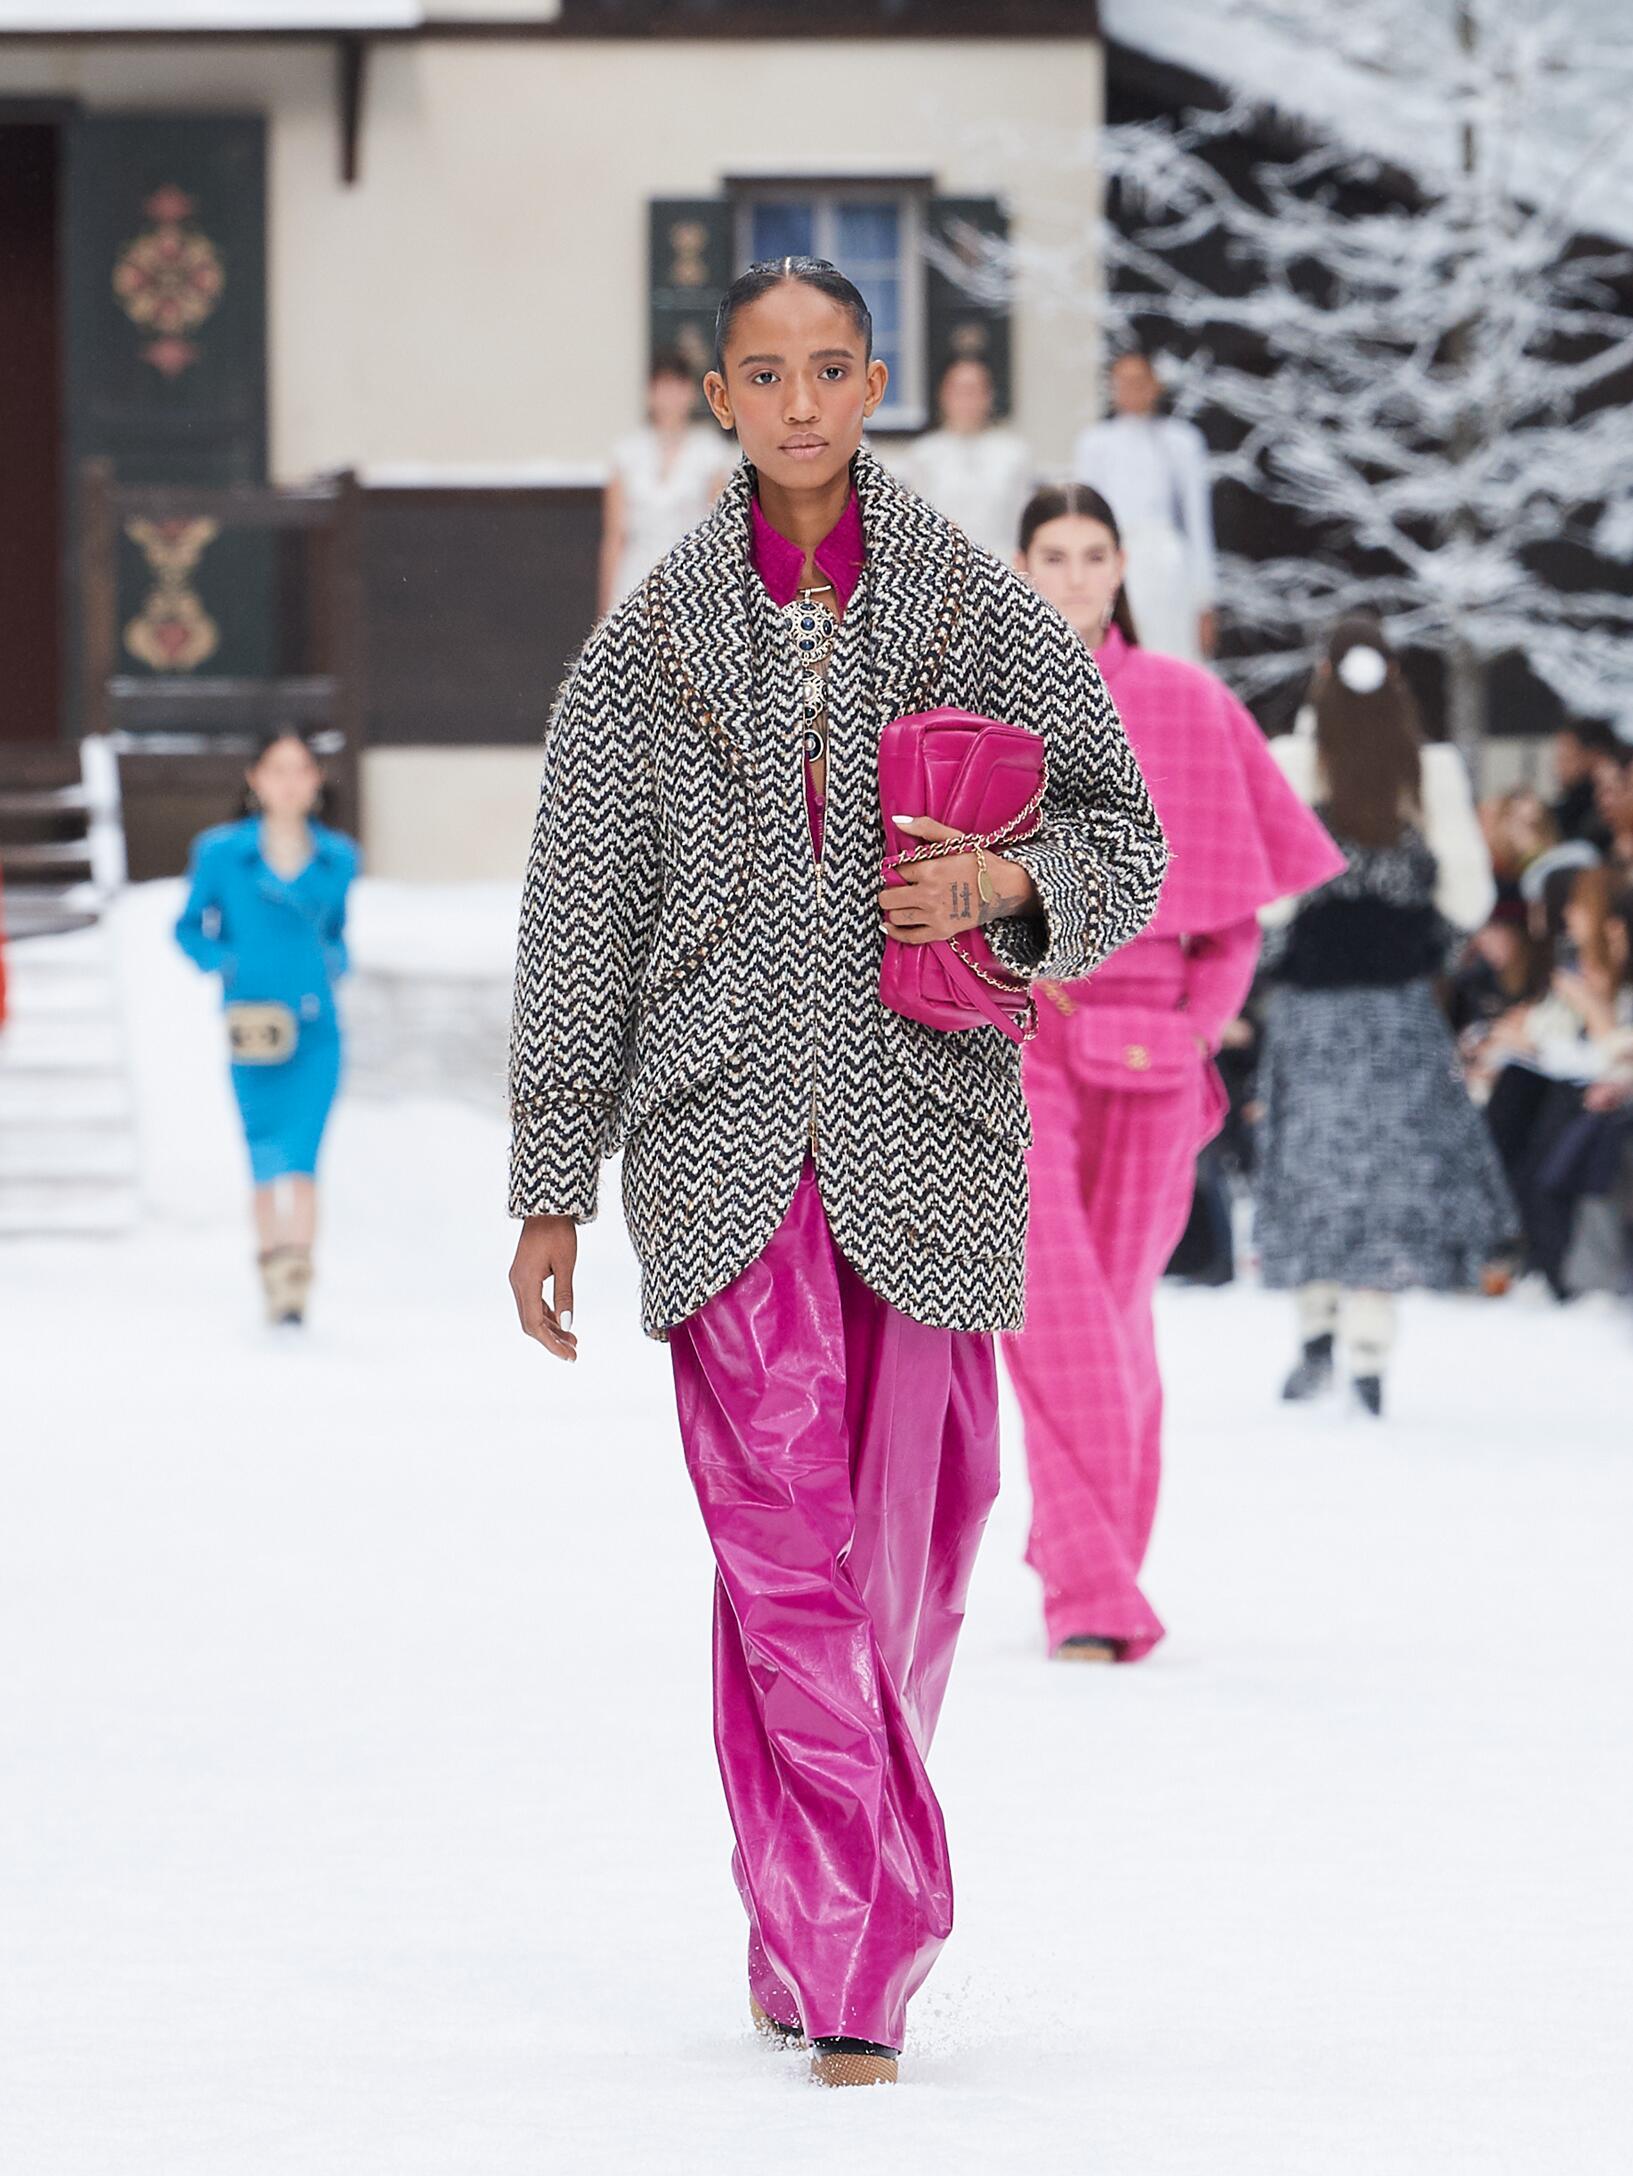 2019 Chanel Winter Catwalk